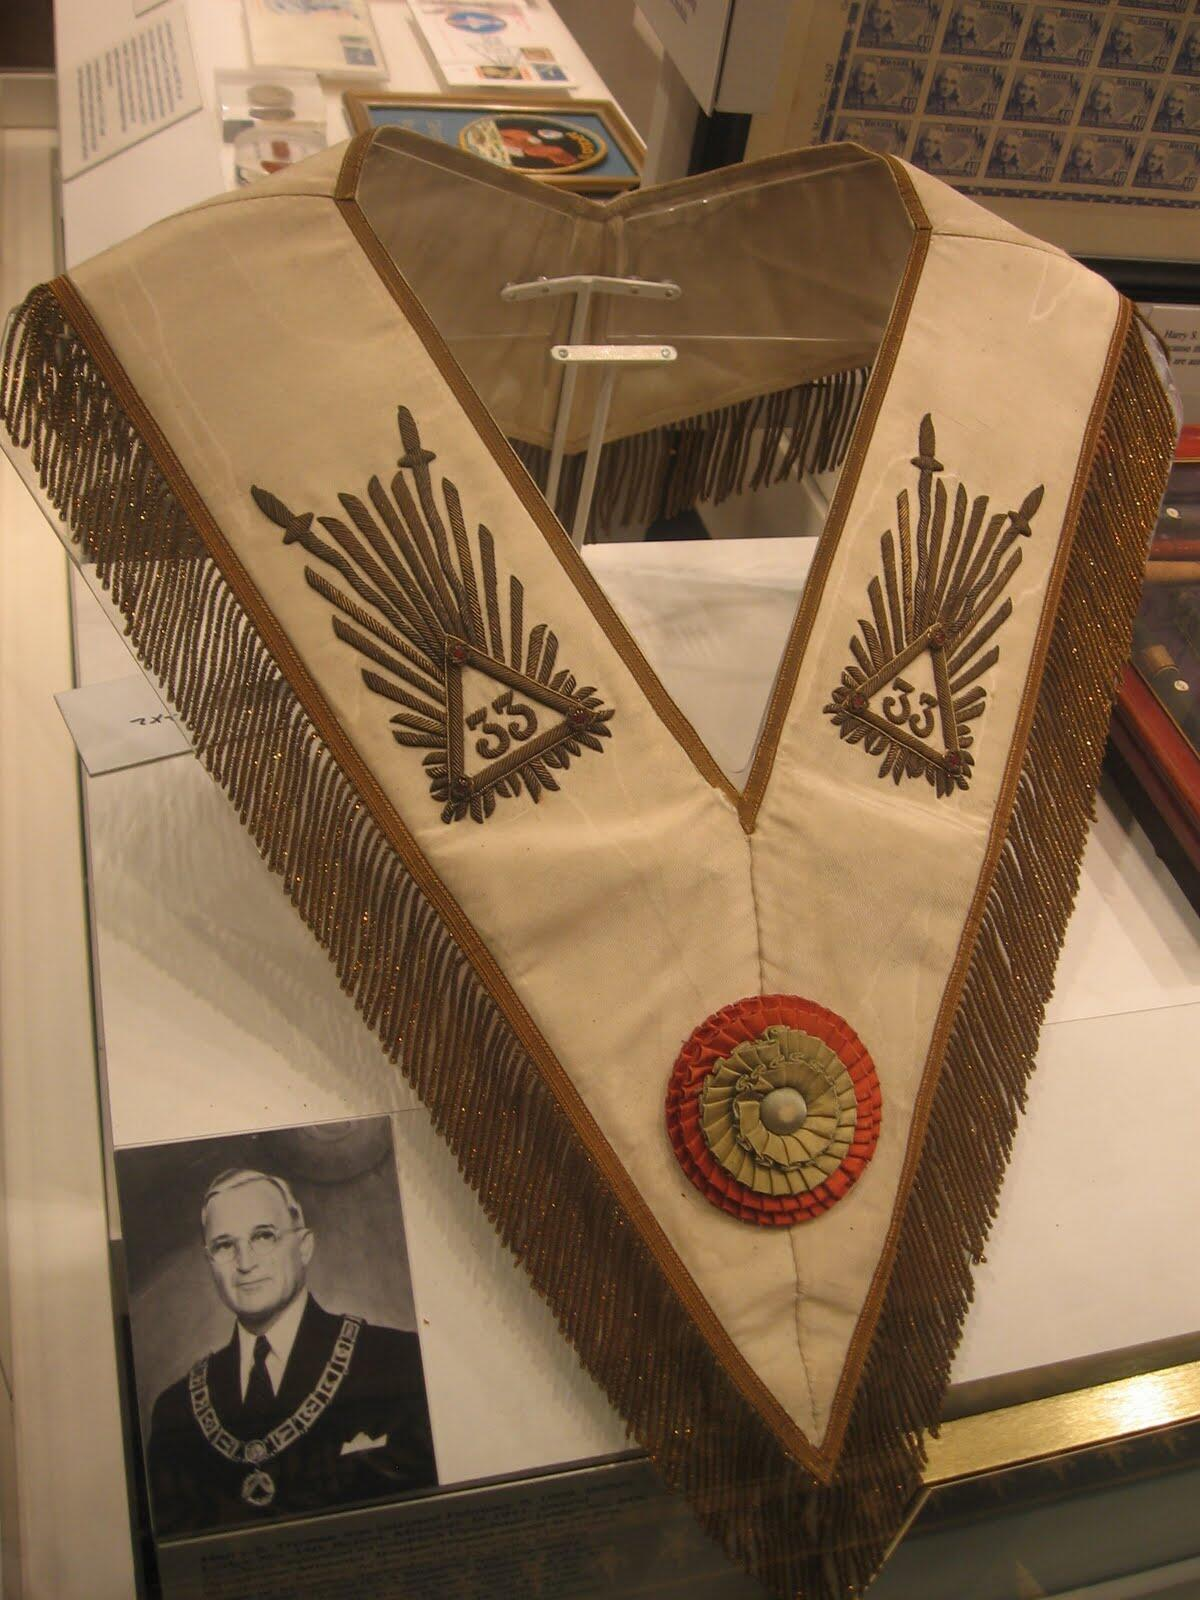 El presidente Harry S. Truman BWPwiQ1CMAEpIjK